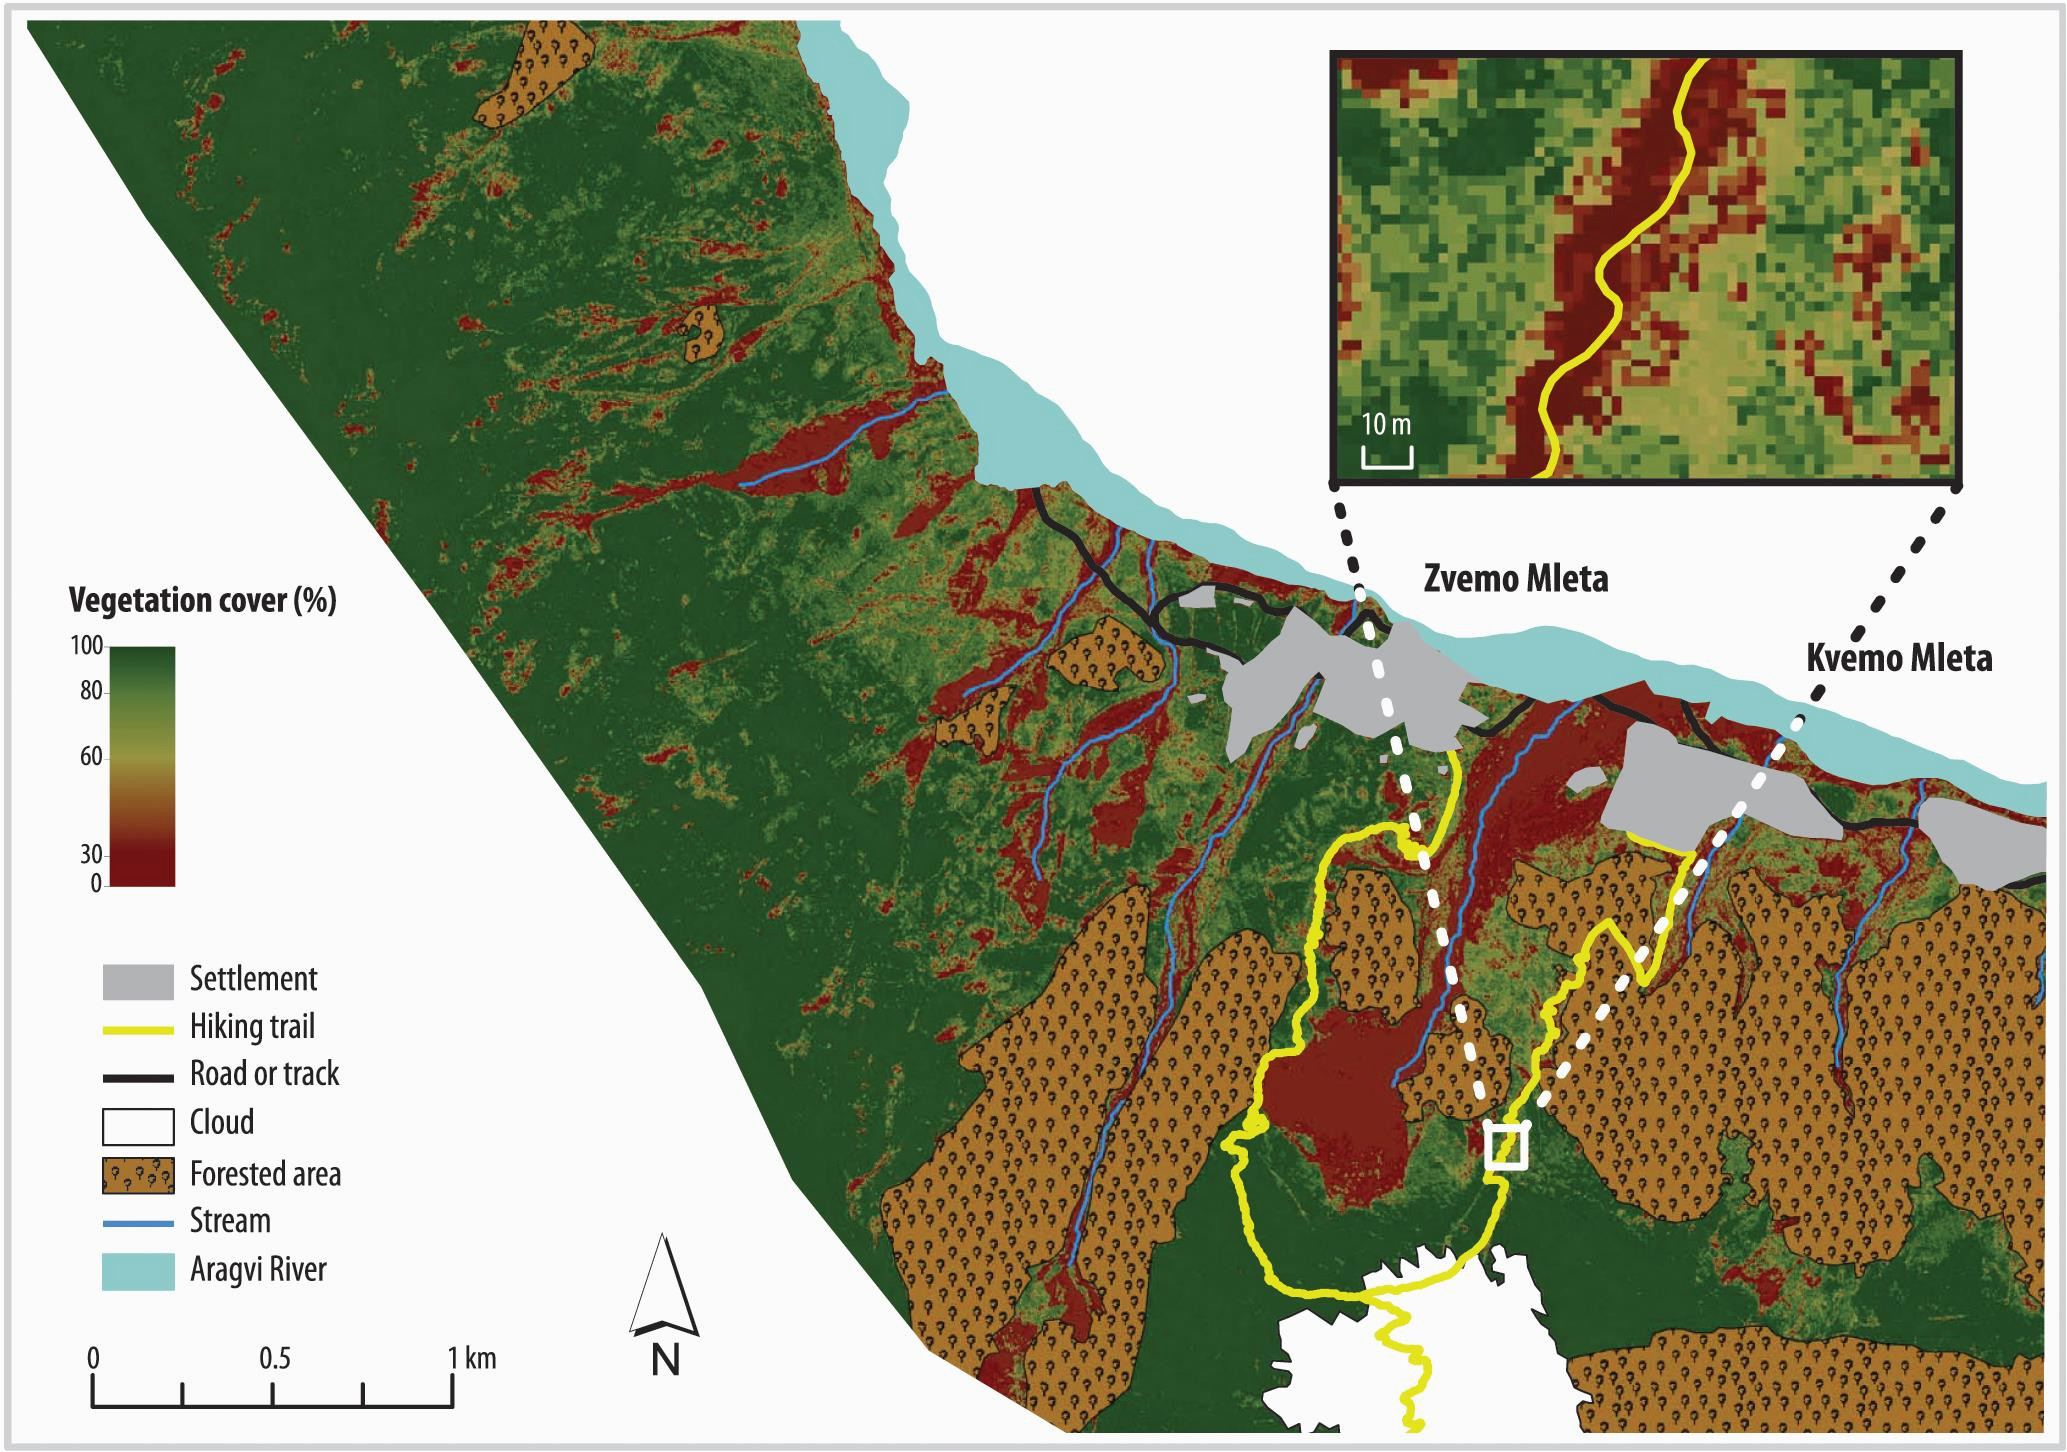 estimating vegetation cover from high resolution satellite